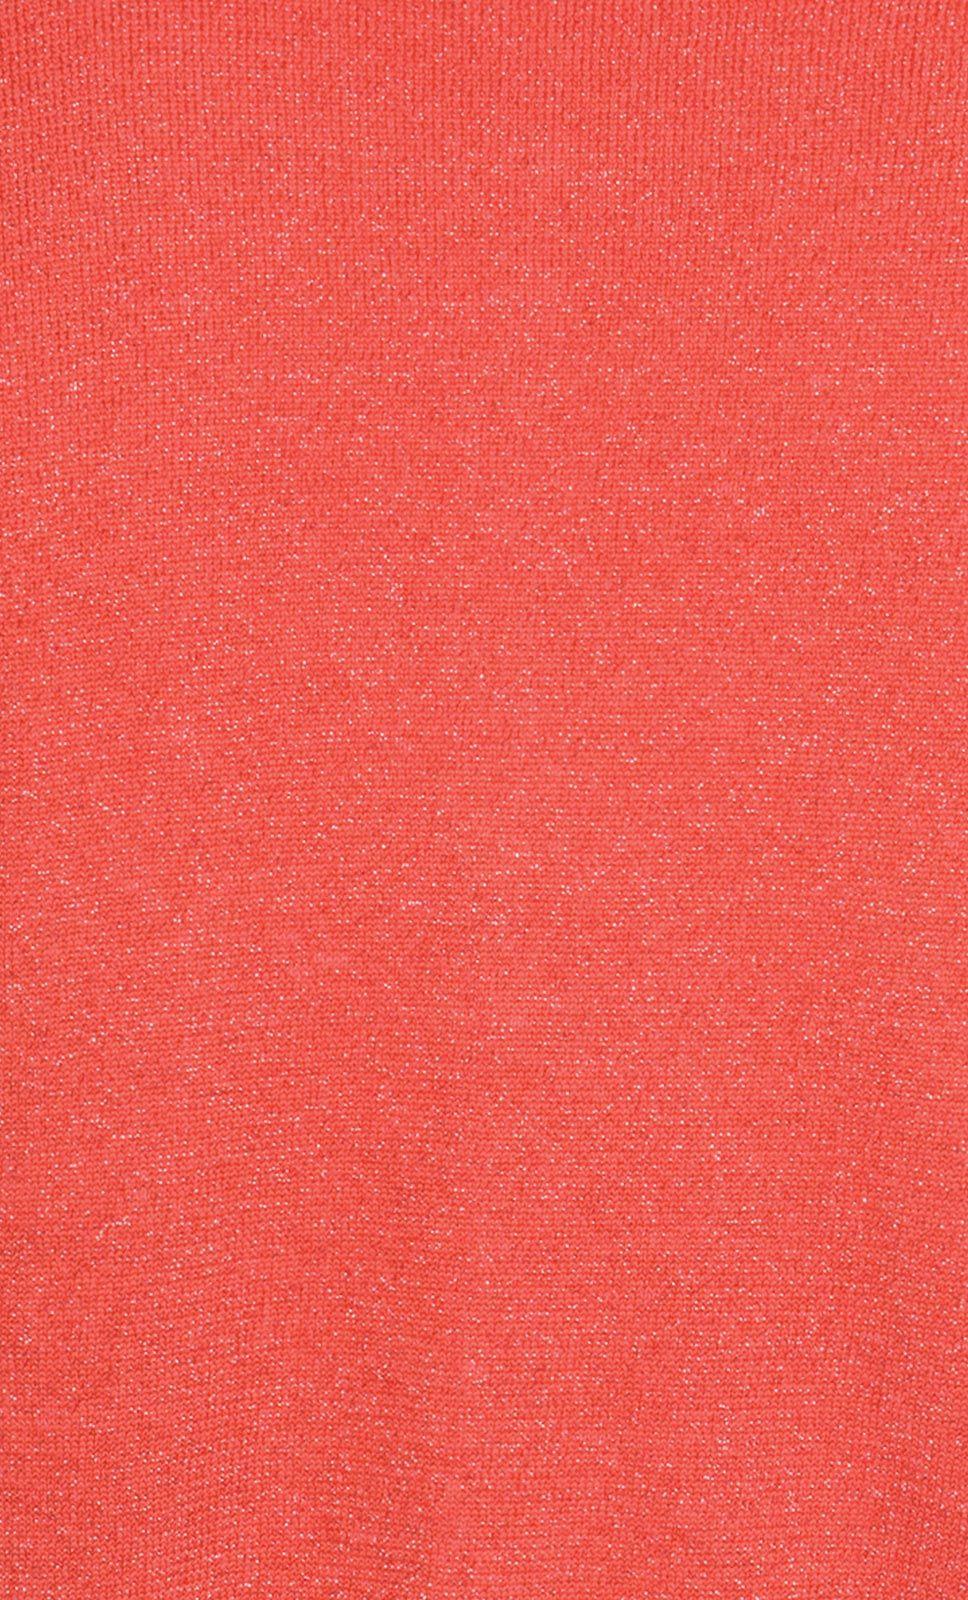 Lapis-Cayenne-Pink